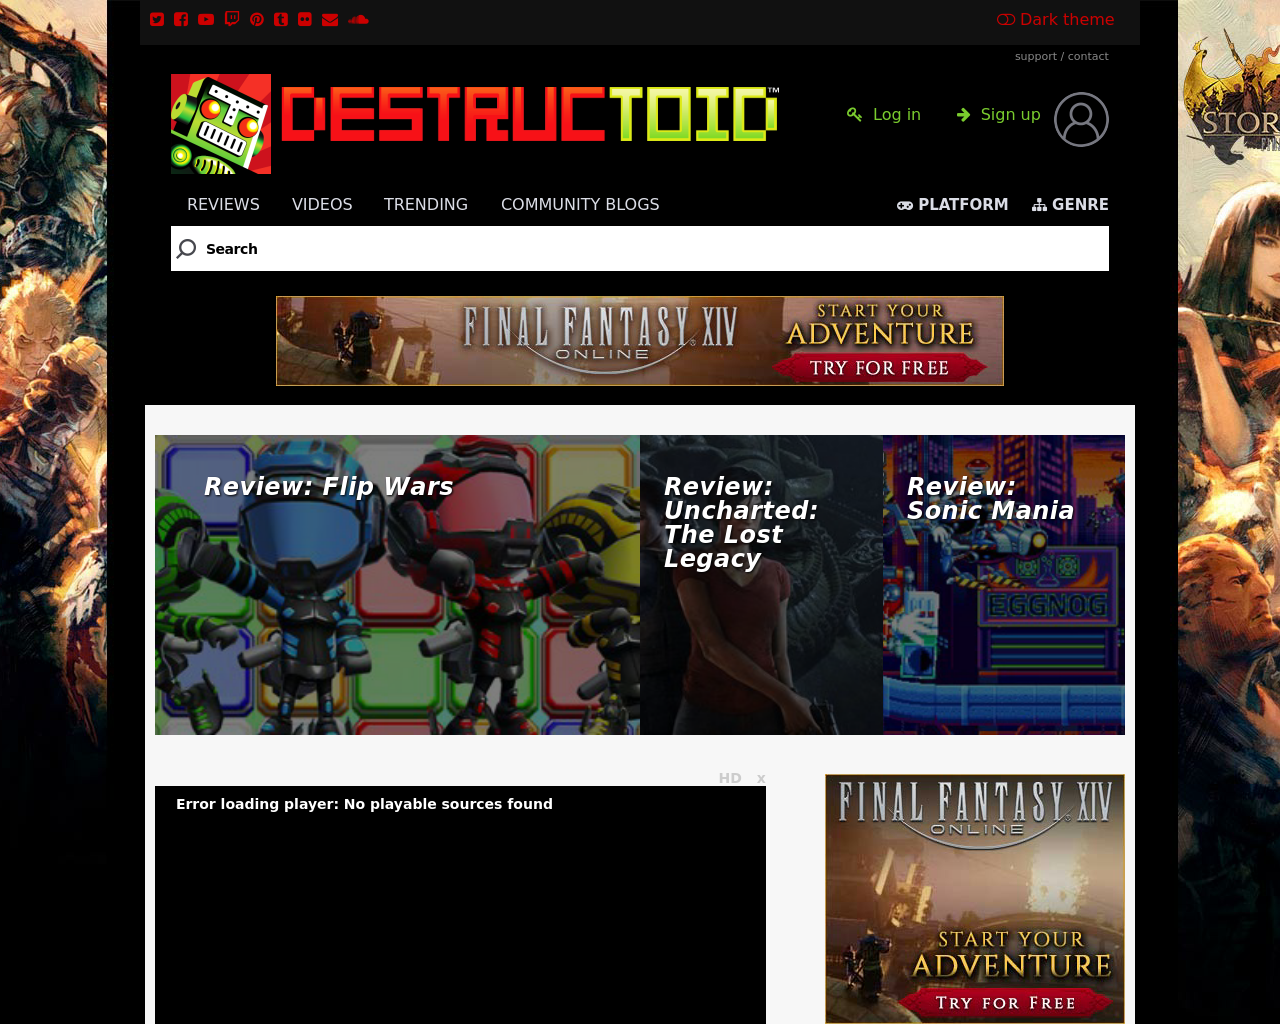 Destructoid-Advertising-Reviews-Pricing